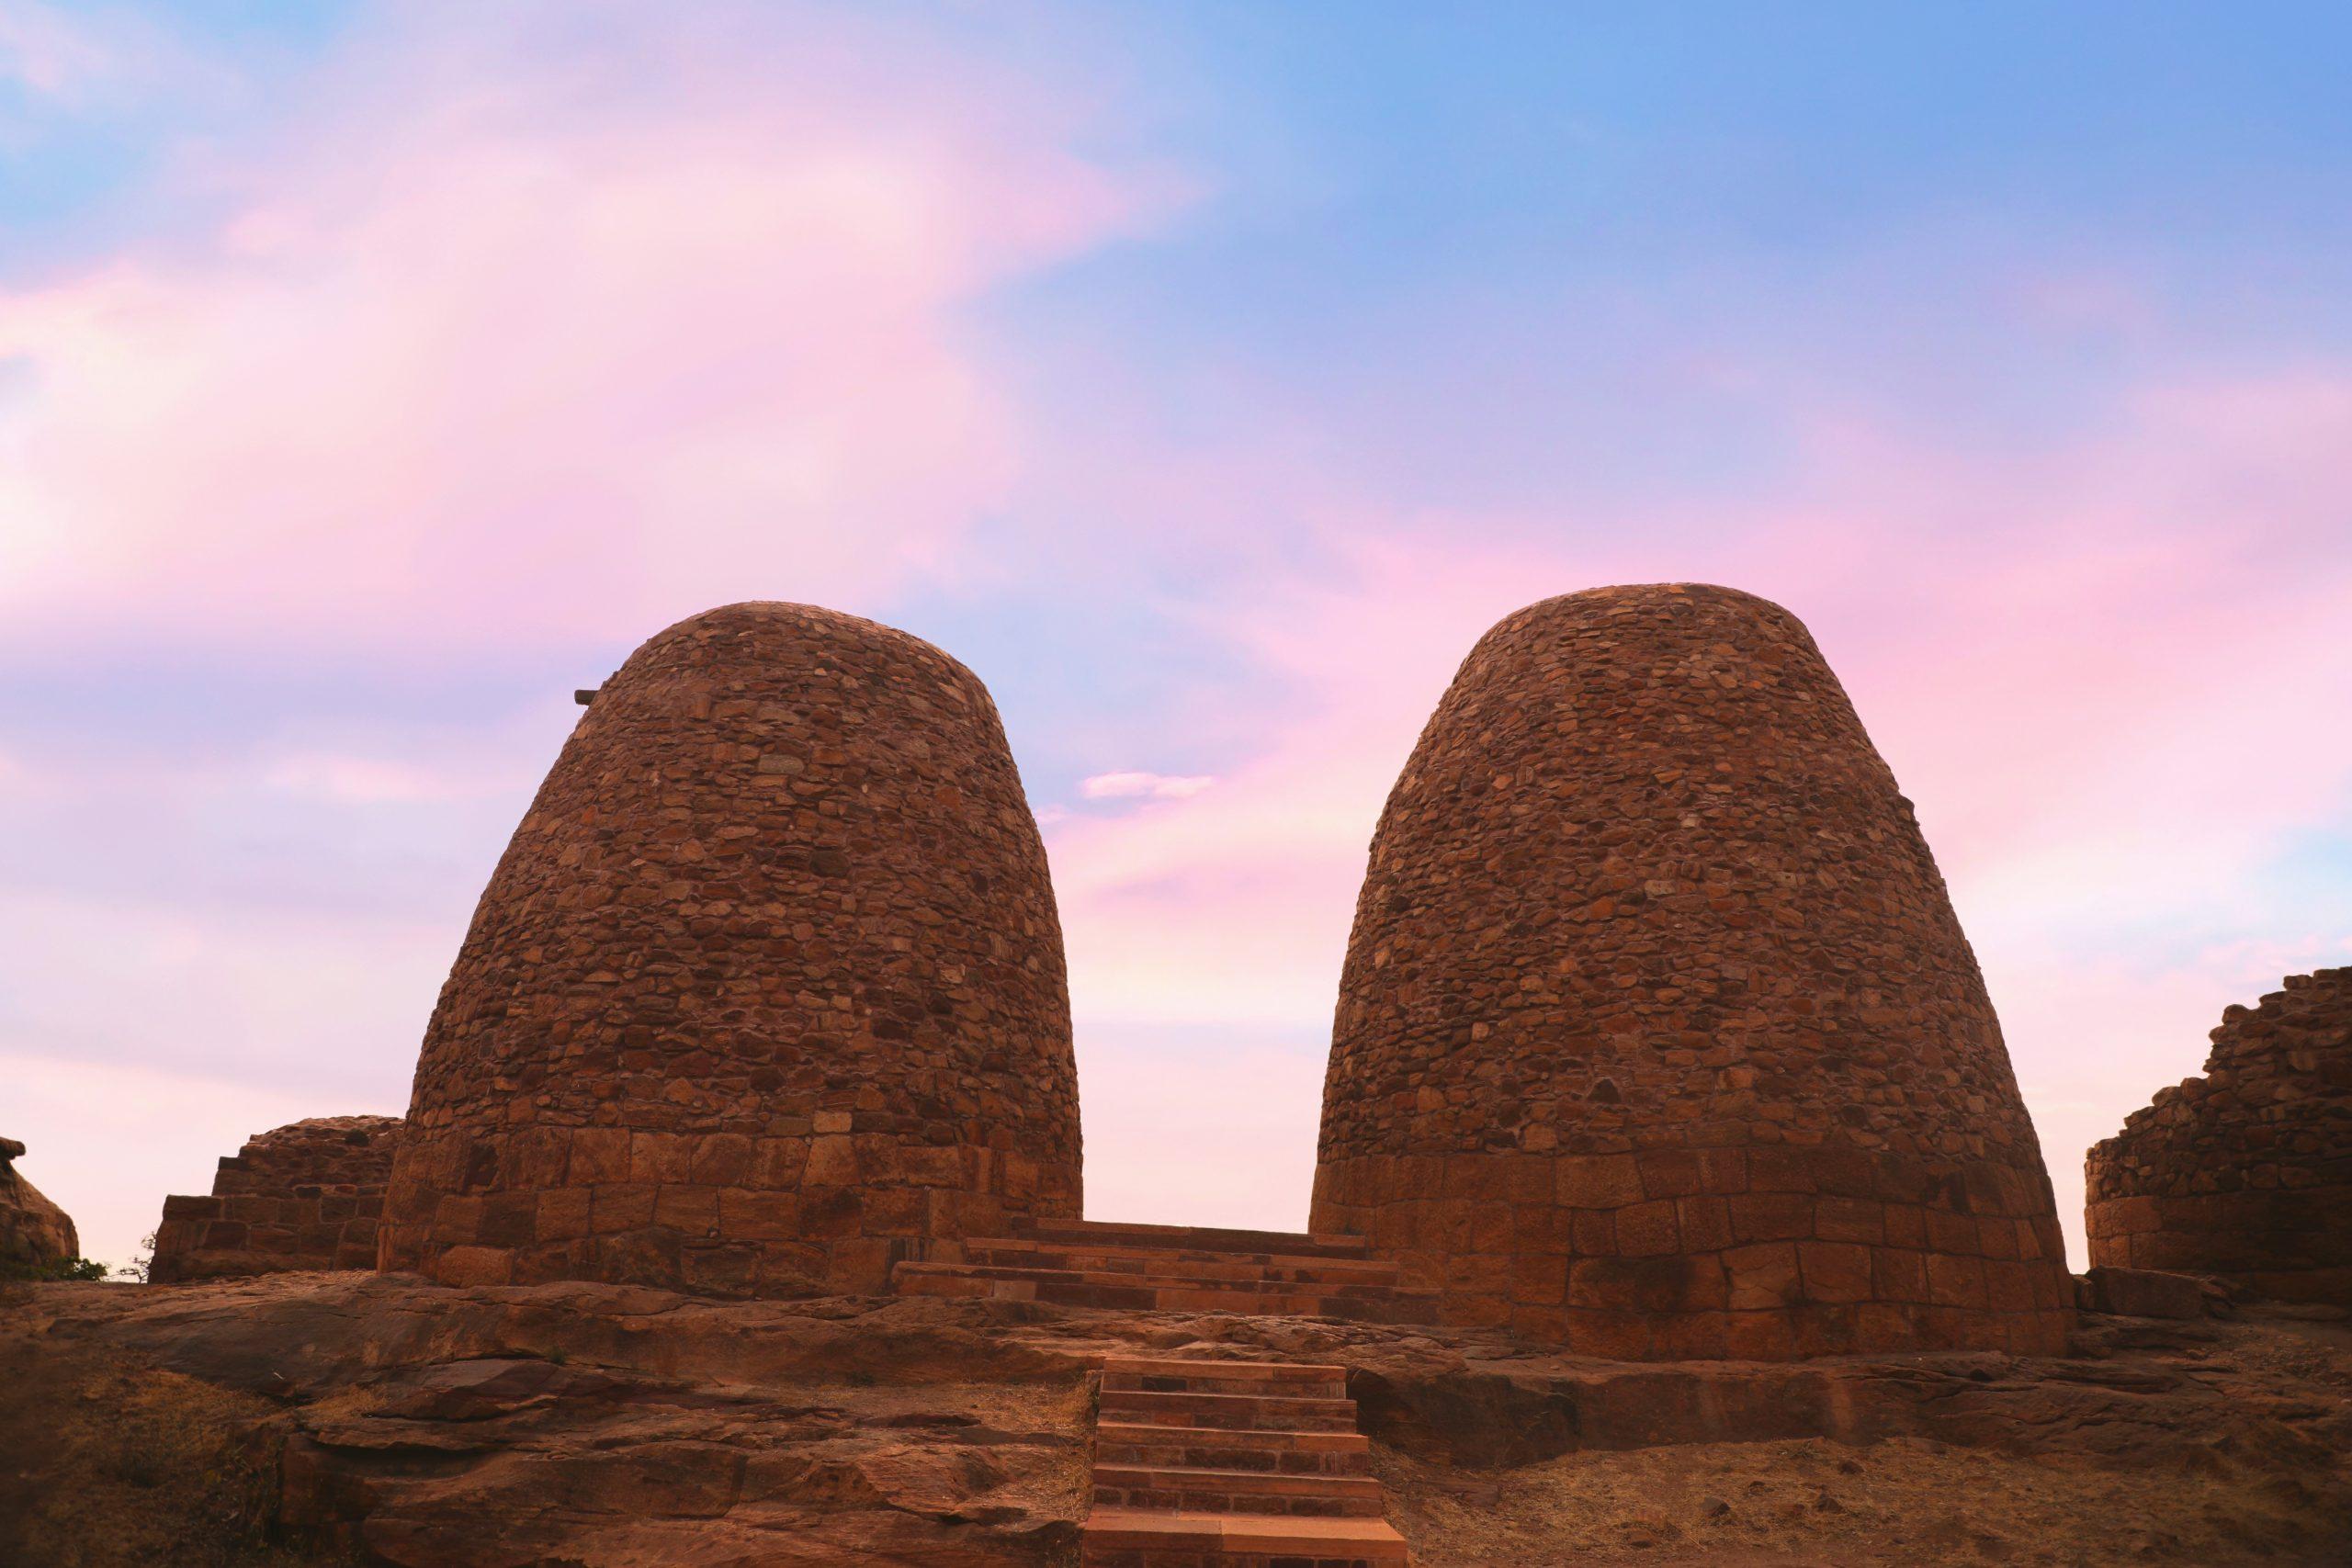 Rock structures in Badami, Karnataka